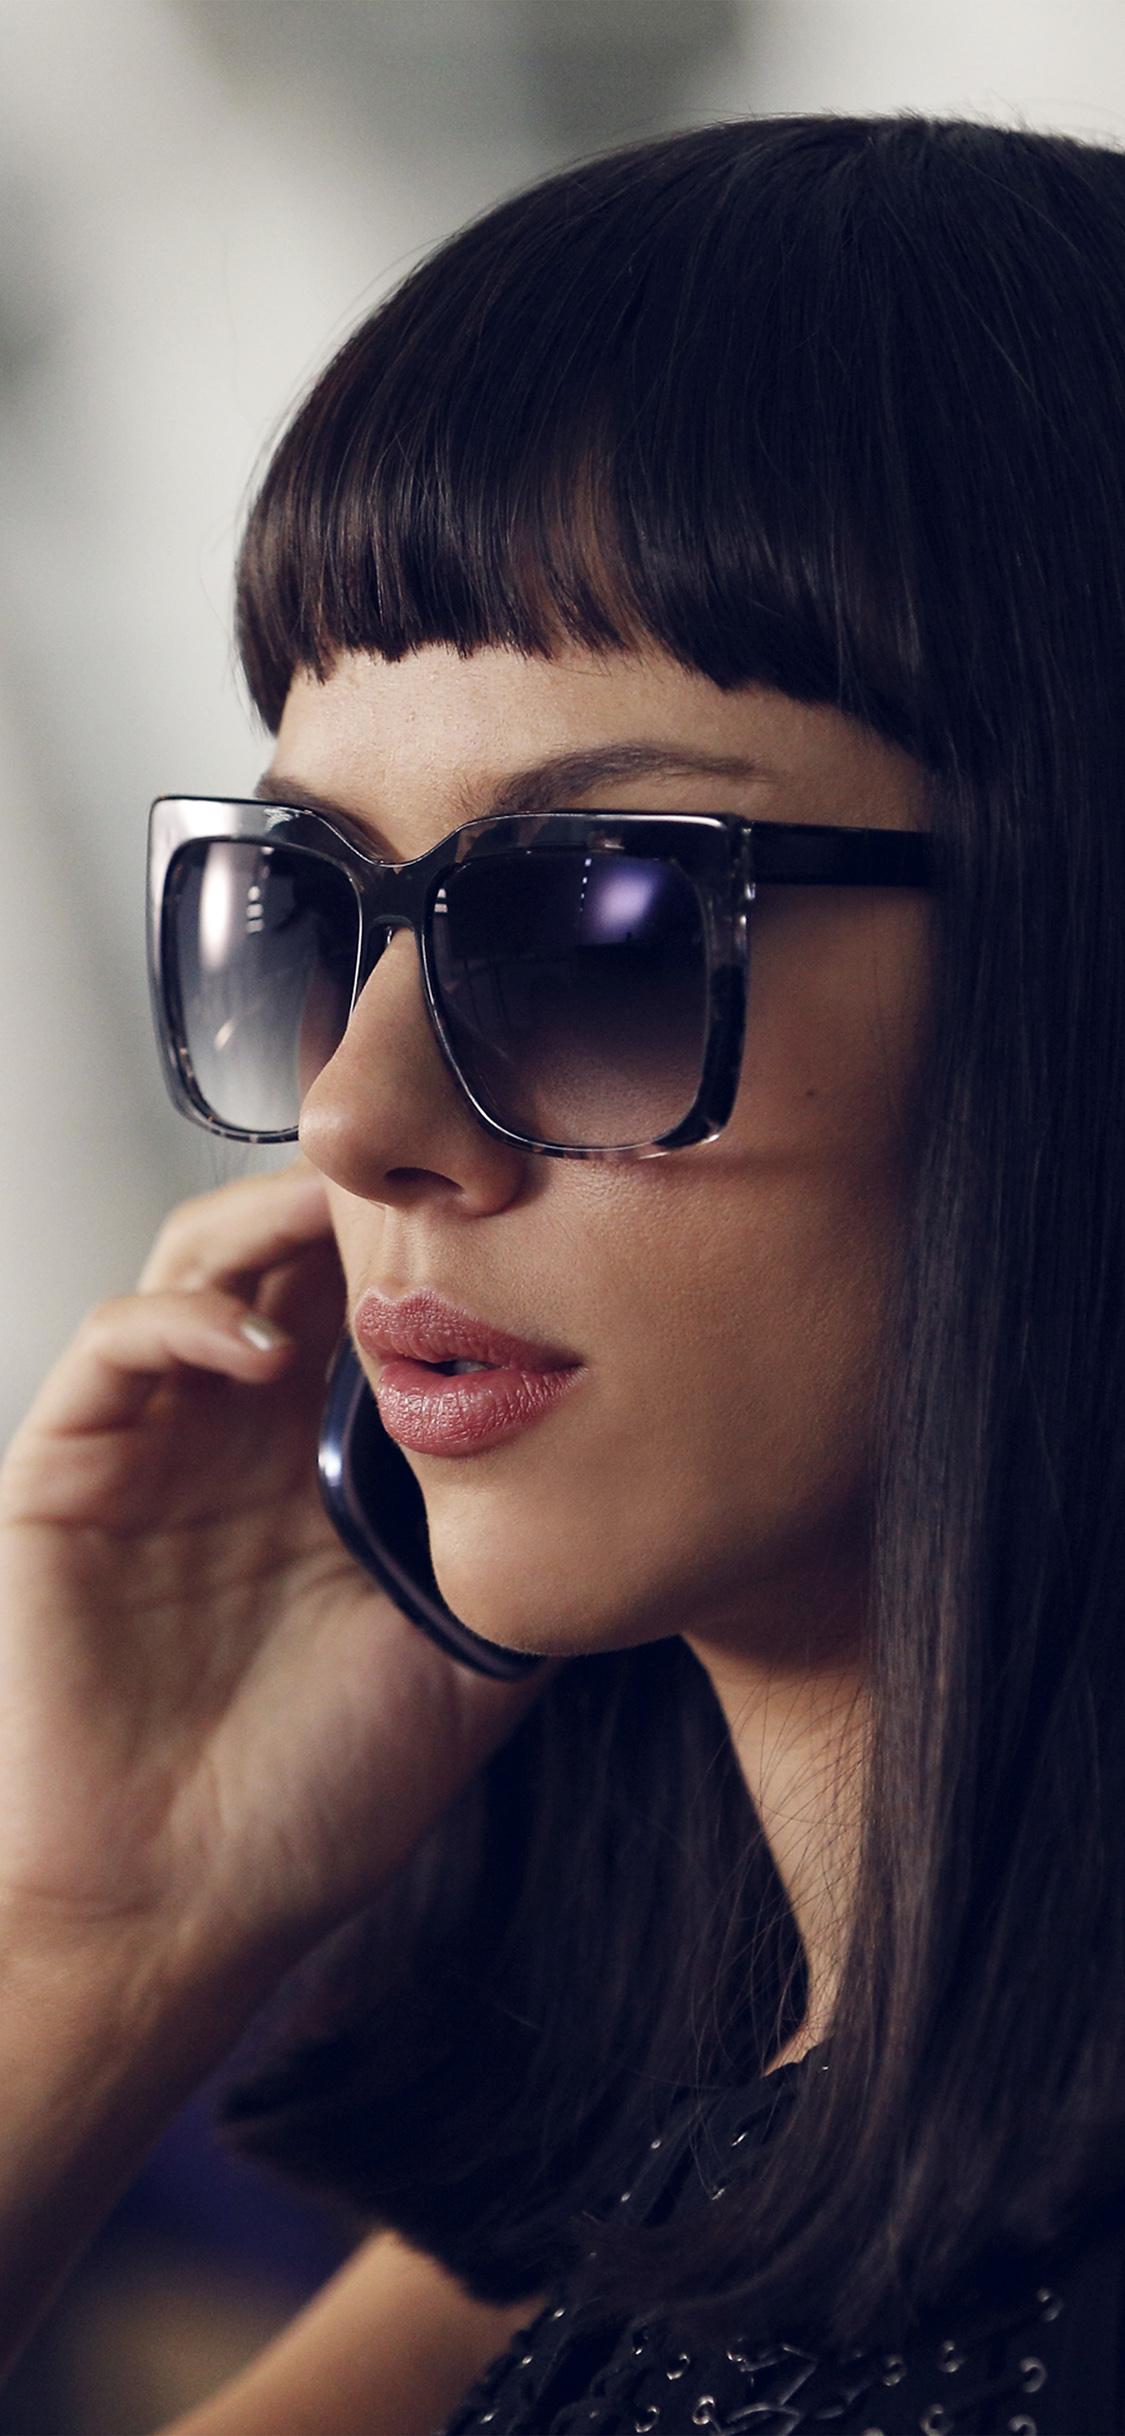 iPhoneXpapers.com-Apple-iPhone-wallpaper-hm43-scarlett-johansson-actress-celebrity-sunglasses